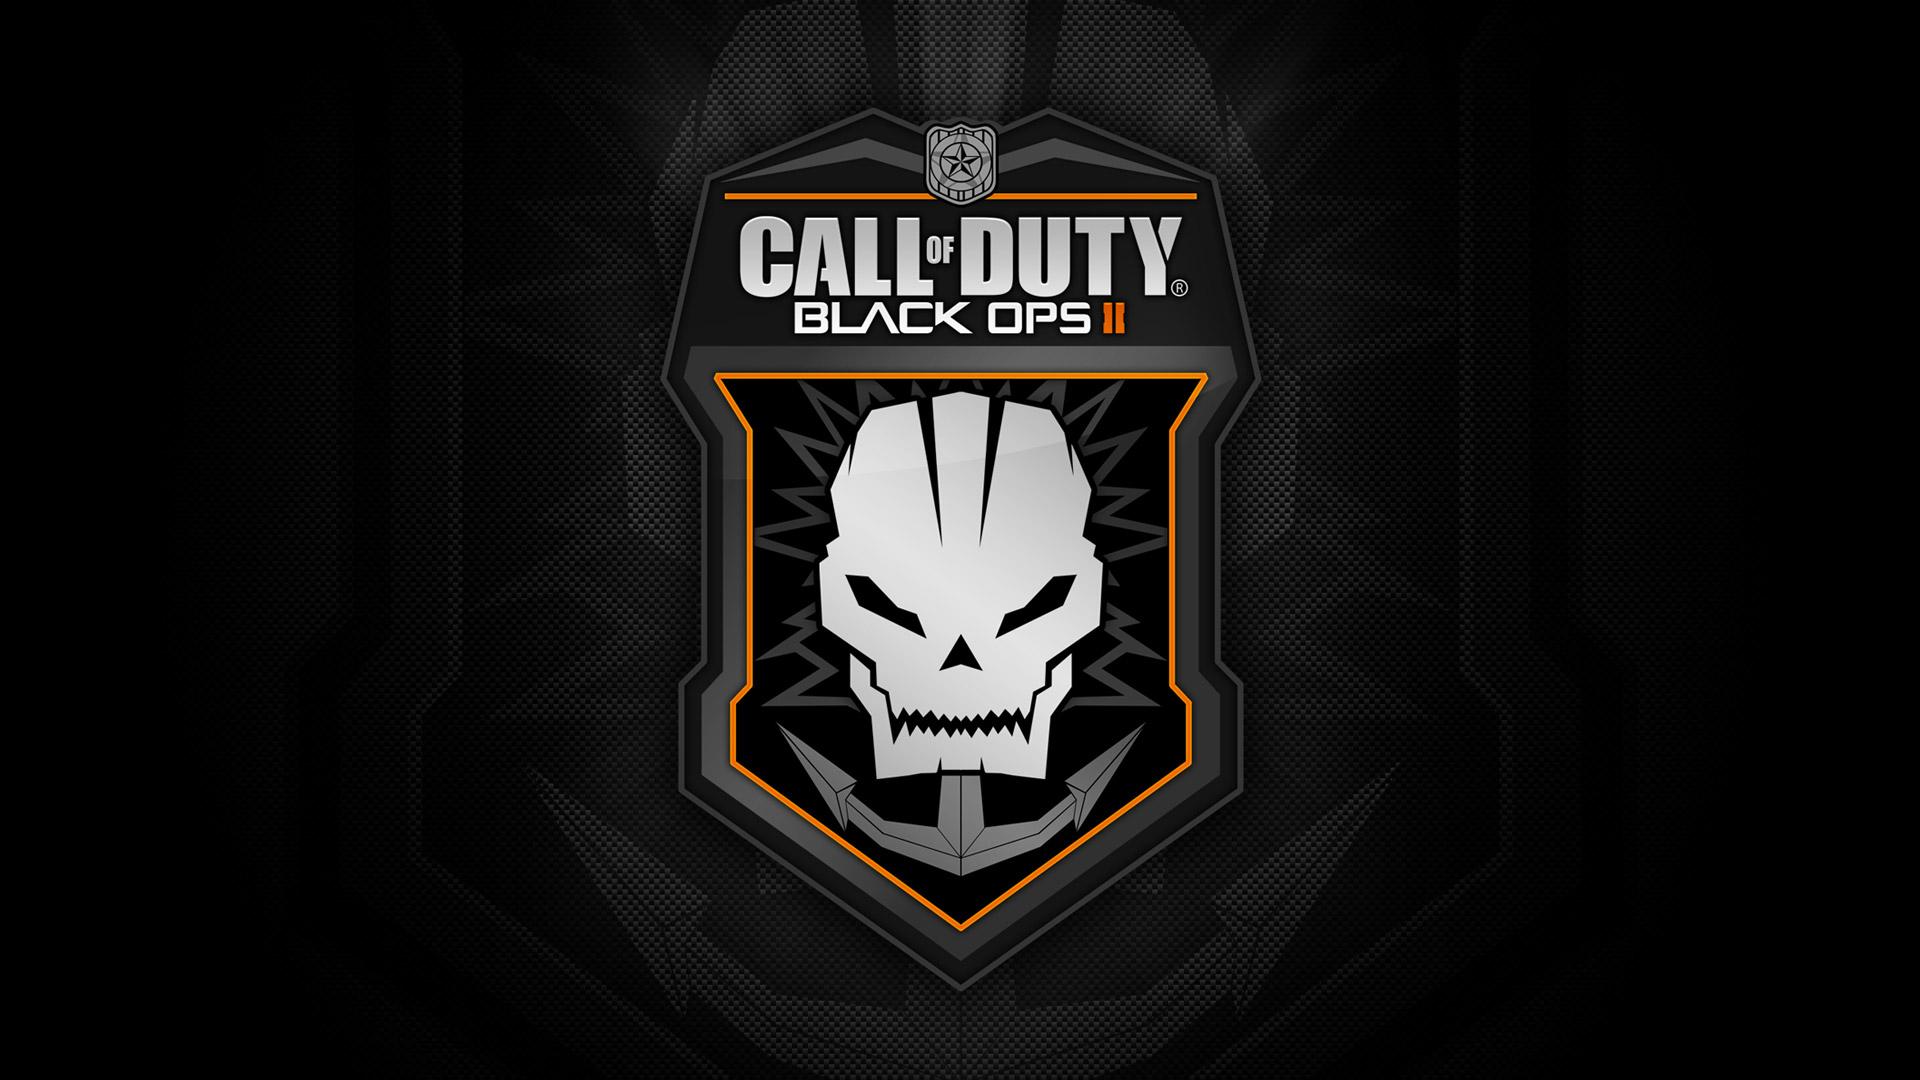 Black Ops 3 Wallpaper Hd